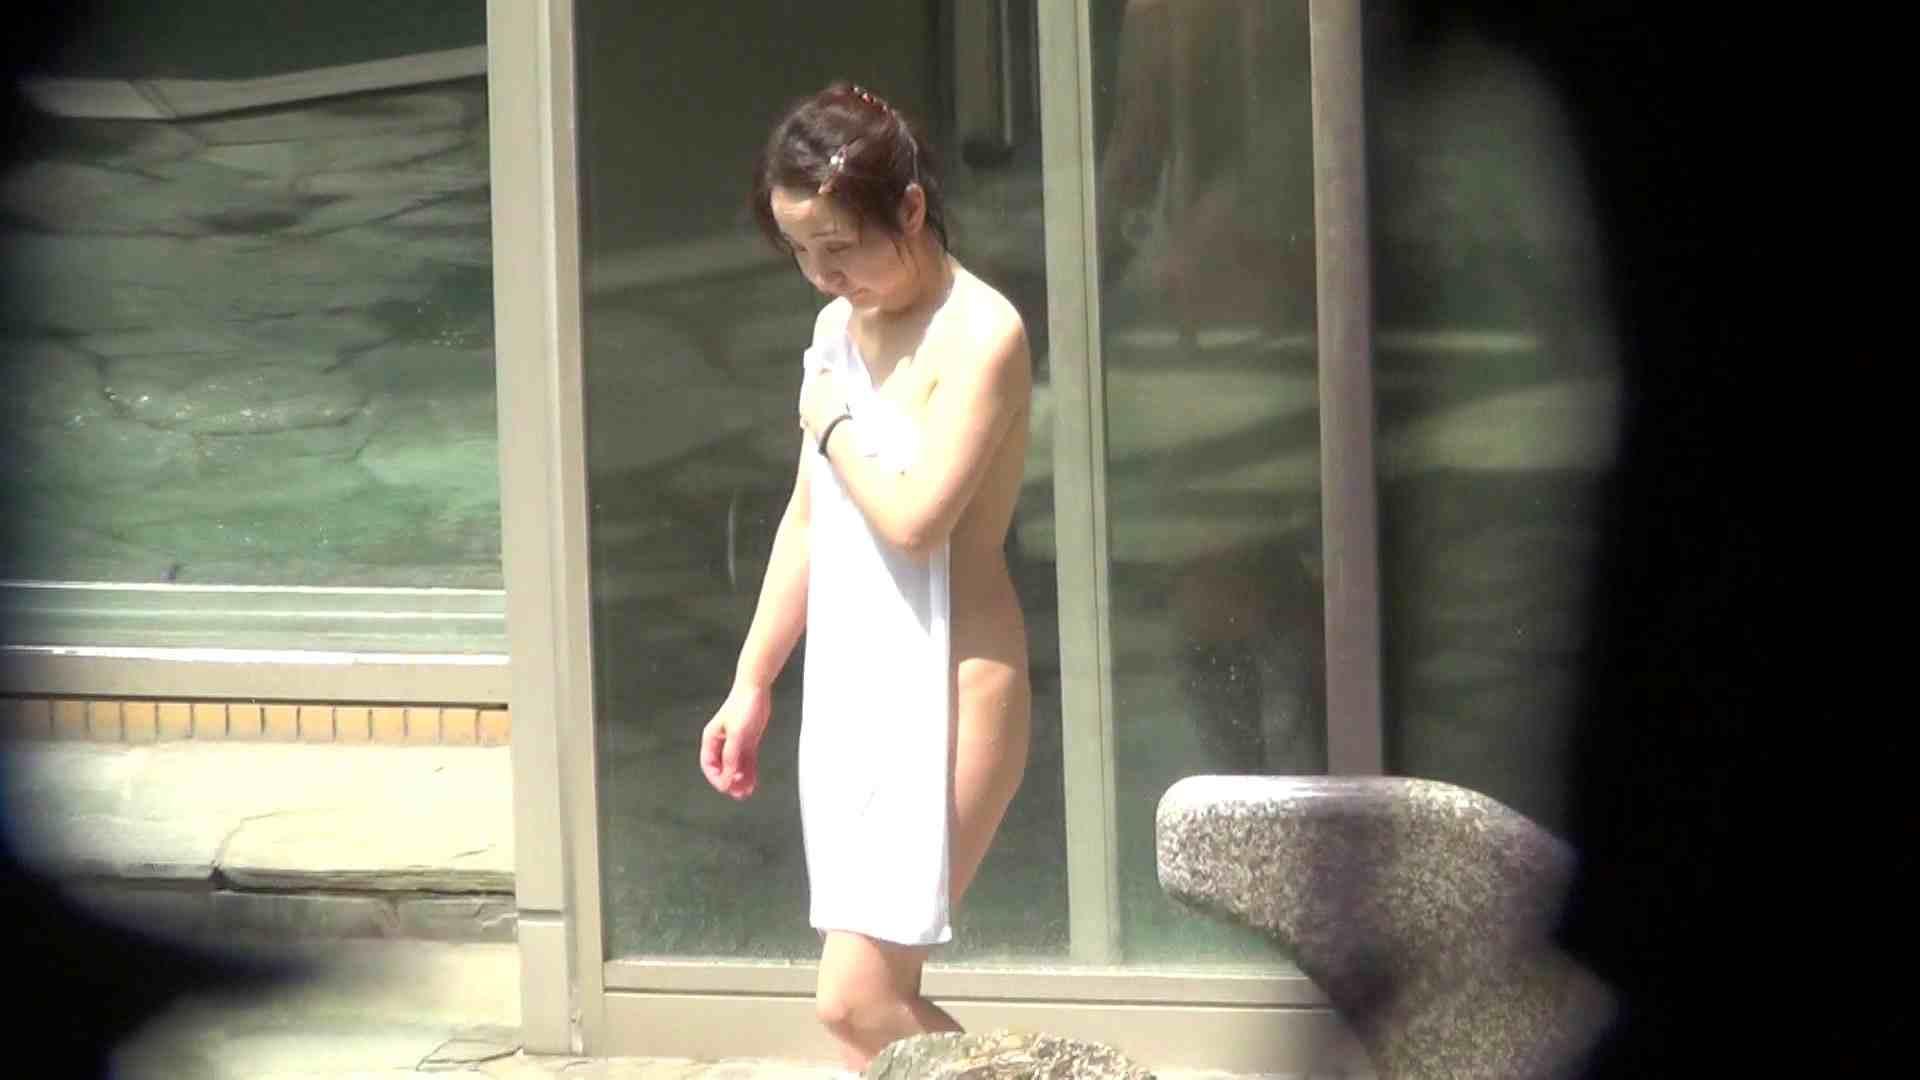 Vol.78 熟しても可愛らしさ残る年増 美女 AV無料動画キャプチャ 58画像 52